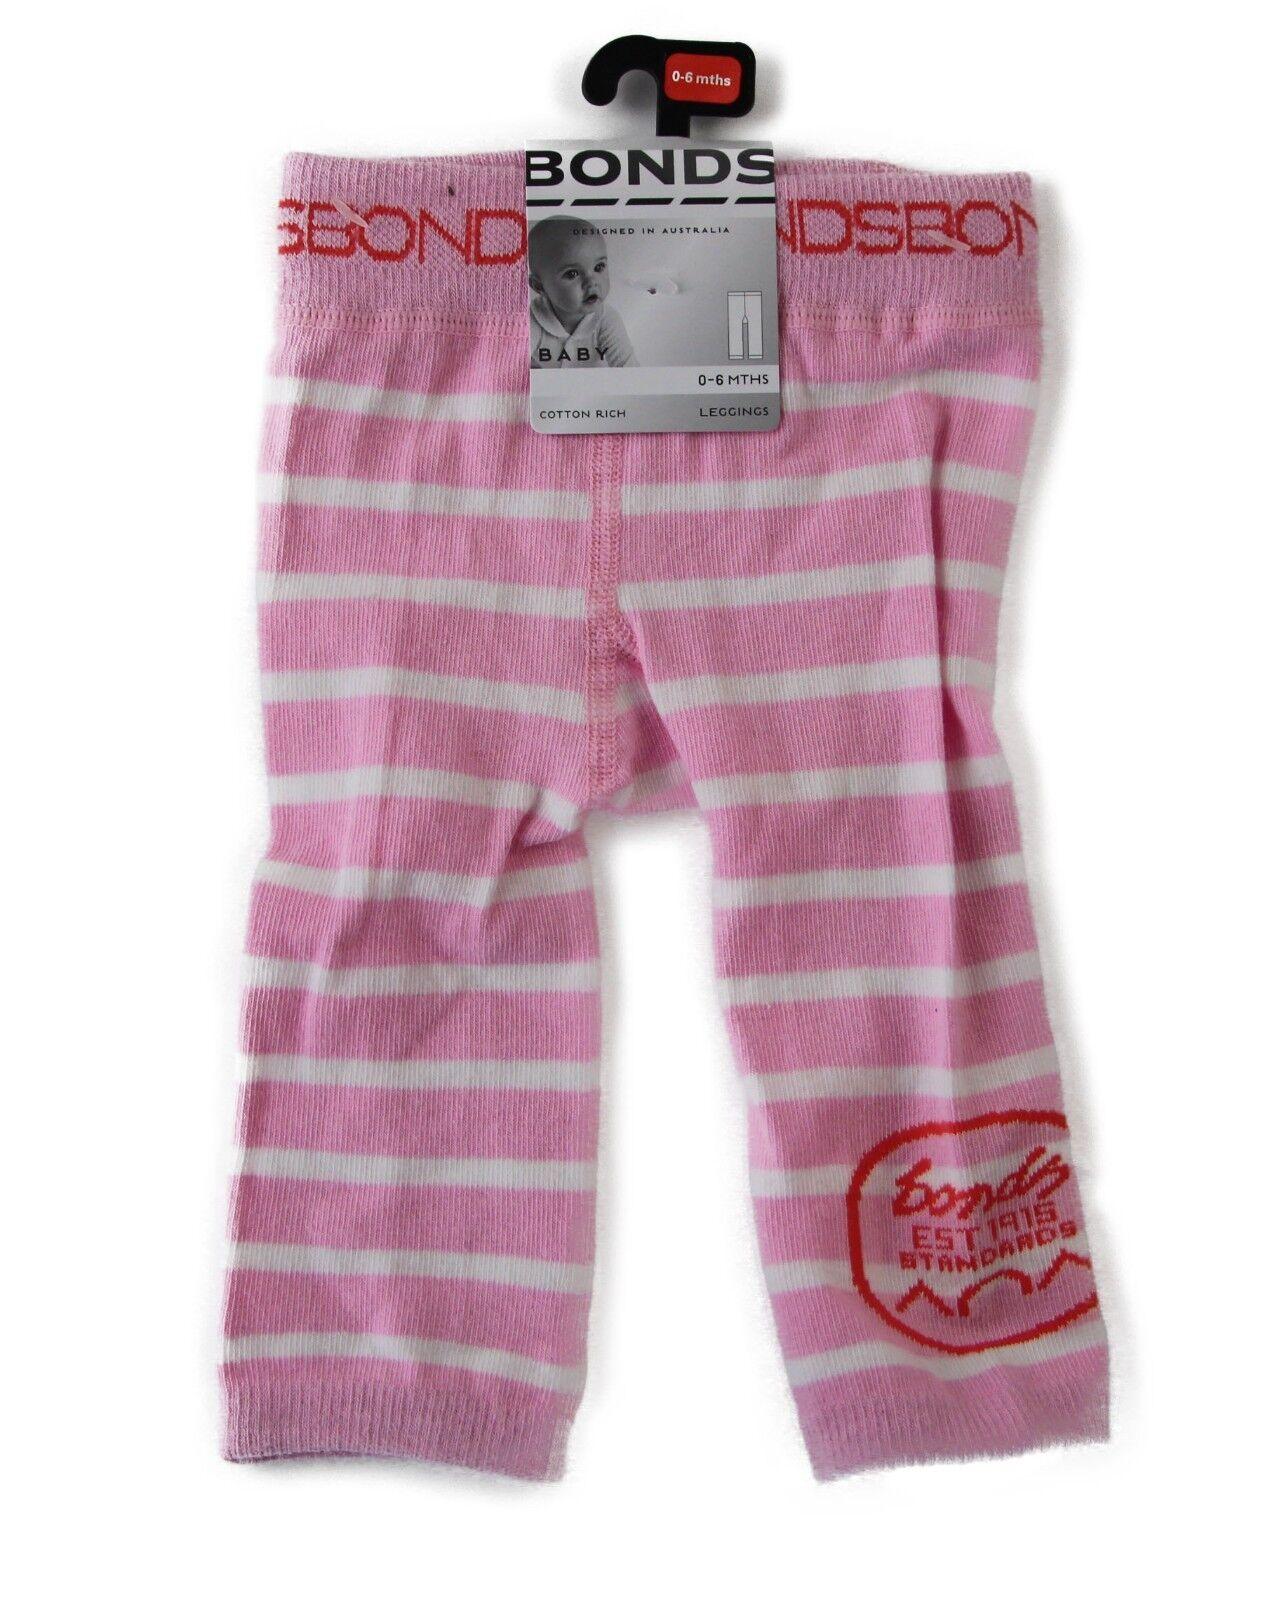 f55abbc35 BONDS BABY CLASSICS LEGGING Leggings NAVY / PINK / GREY Boy Girl ...